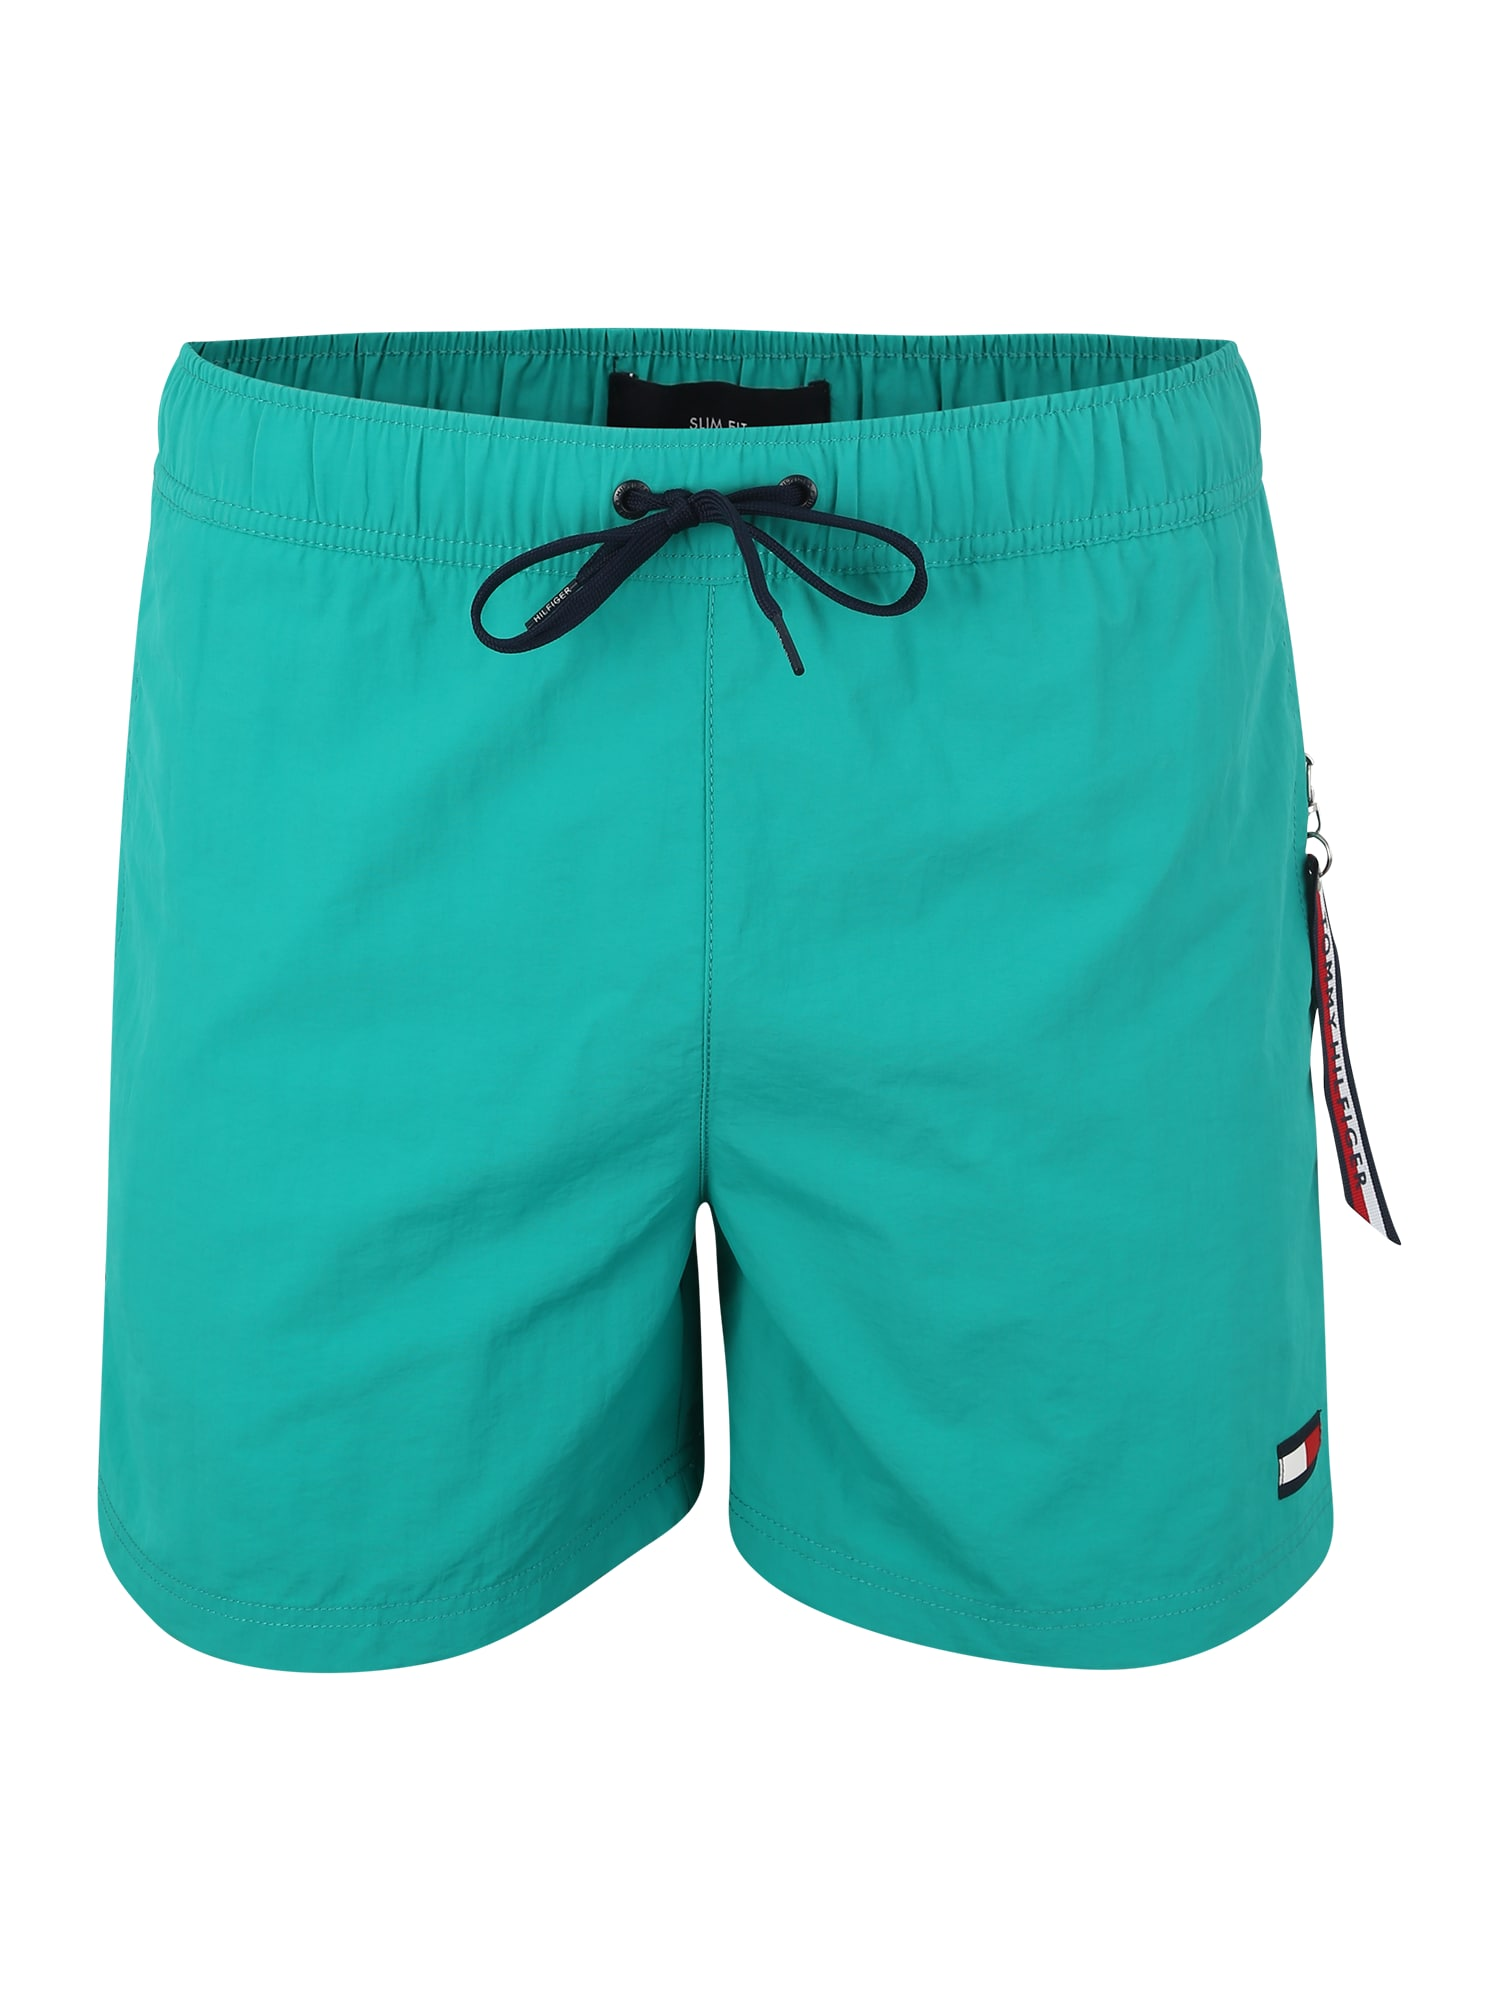 Plavecké šortky SF MEDIUM DRAWSTRING nefritová Tommy Hilfiger Underwear